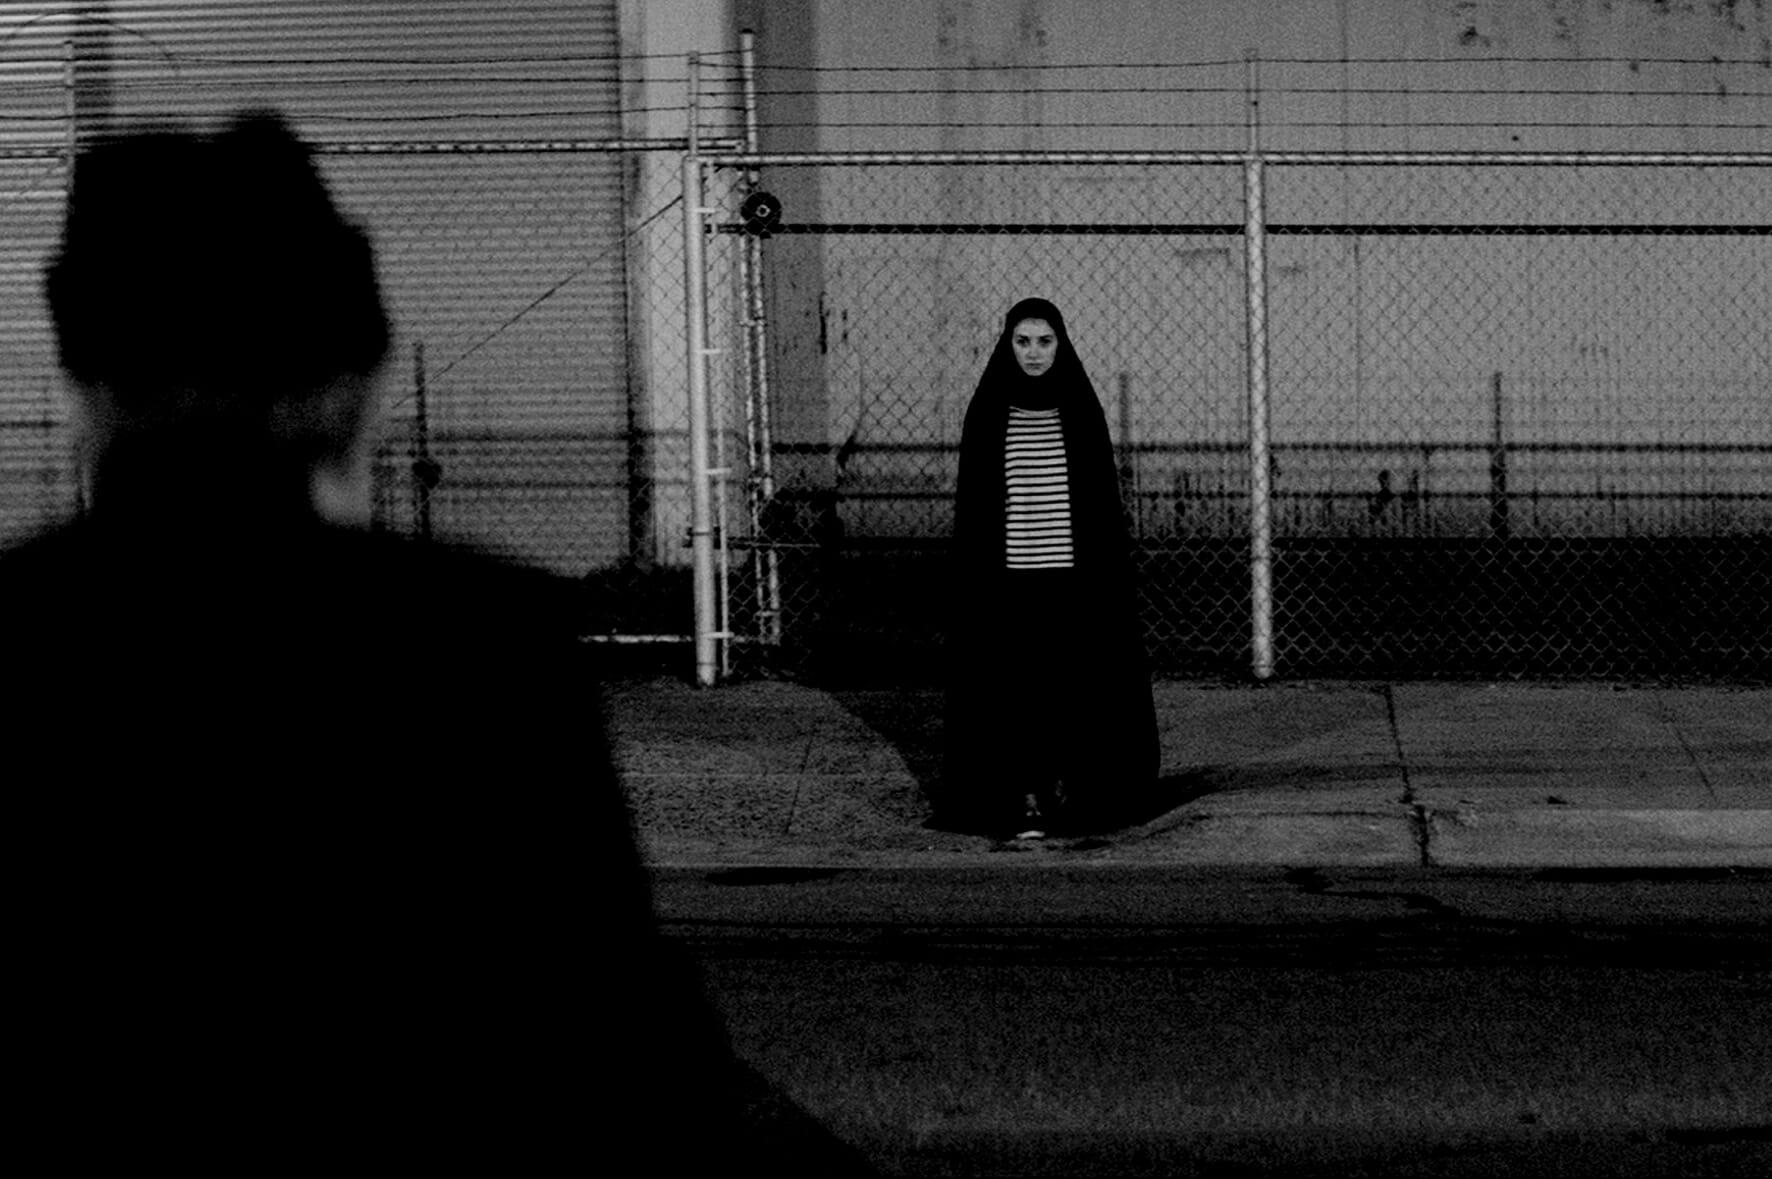 A-girl-walk-home-alone-at-night